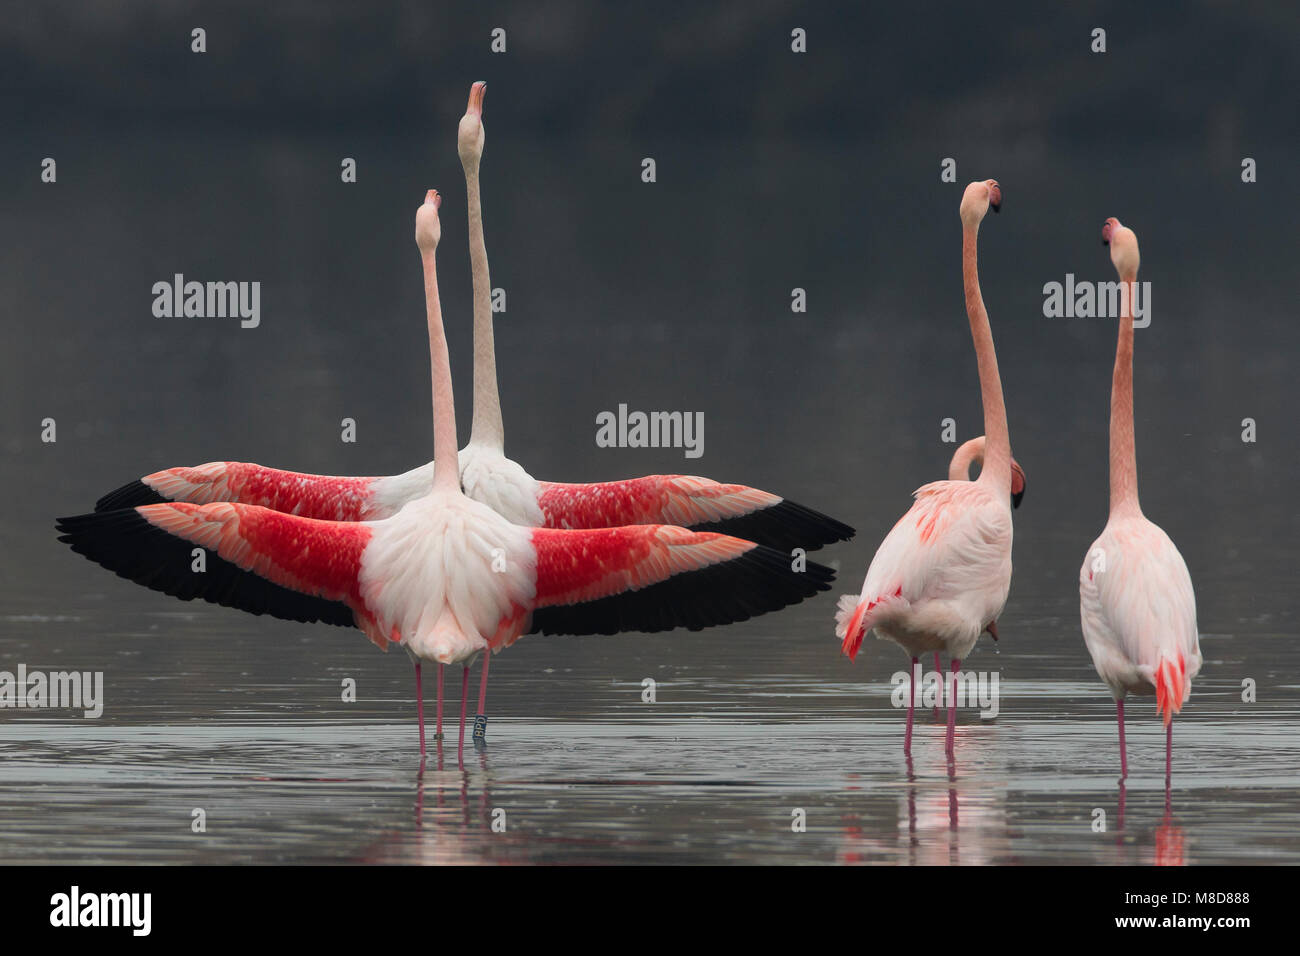 Groep blatsende Flamingo's; Group of displying Greater Flamingo - Stock Image